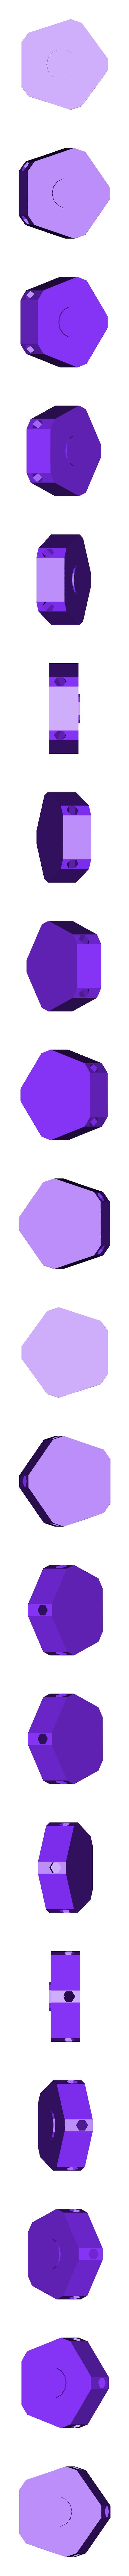 Mini-dome-penta.stl Download free STL file Mini-dome • 3D printable model, Ogrod3d